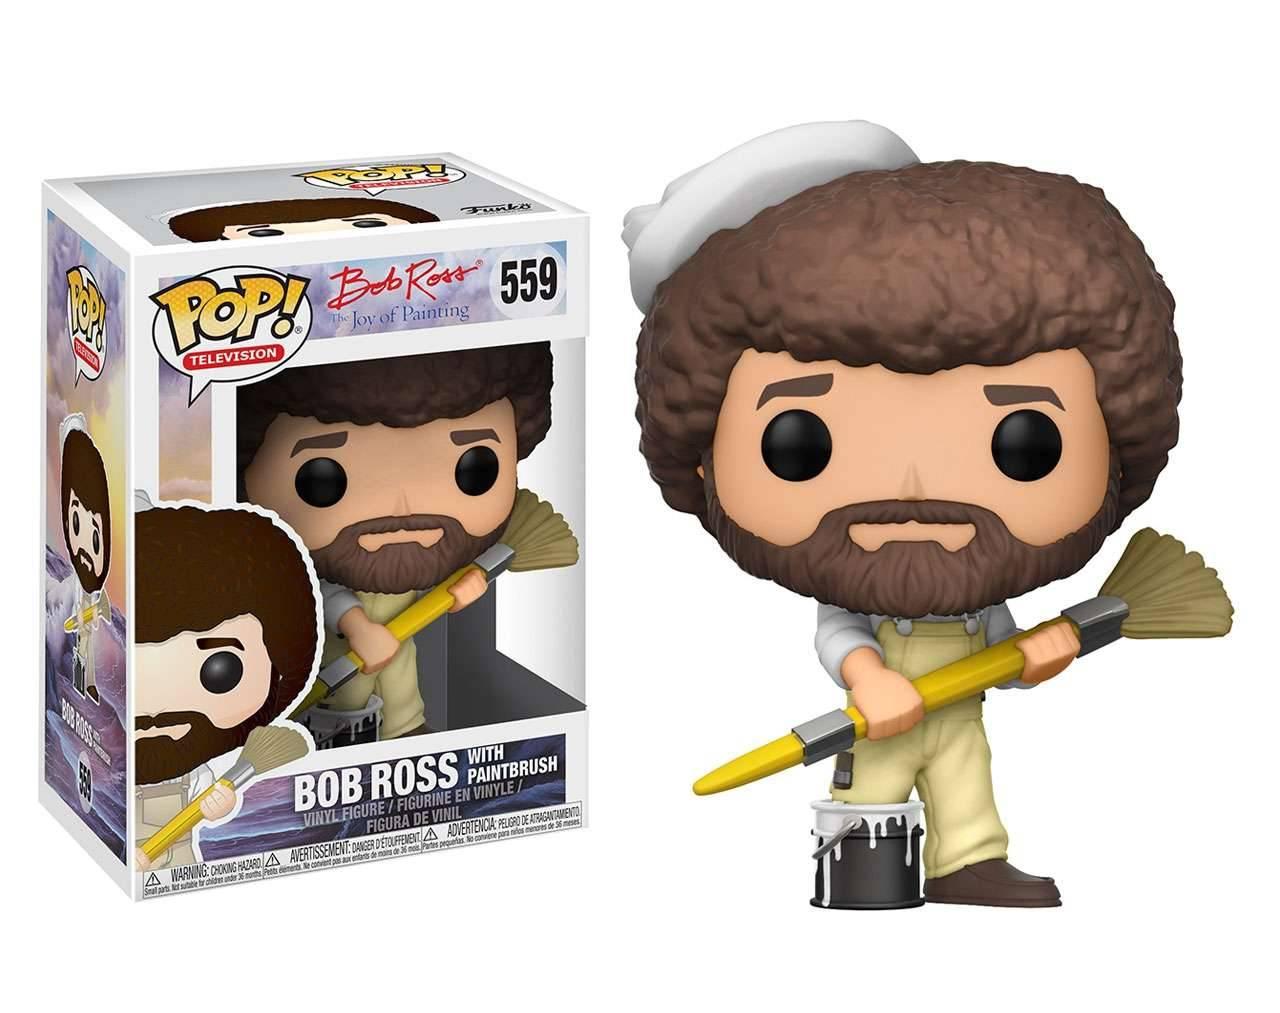 Bob Ross with Paintbrush Pop! Vinyl